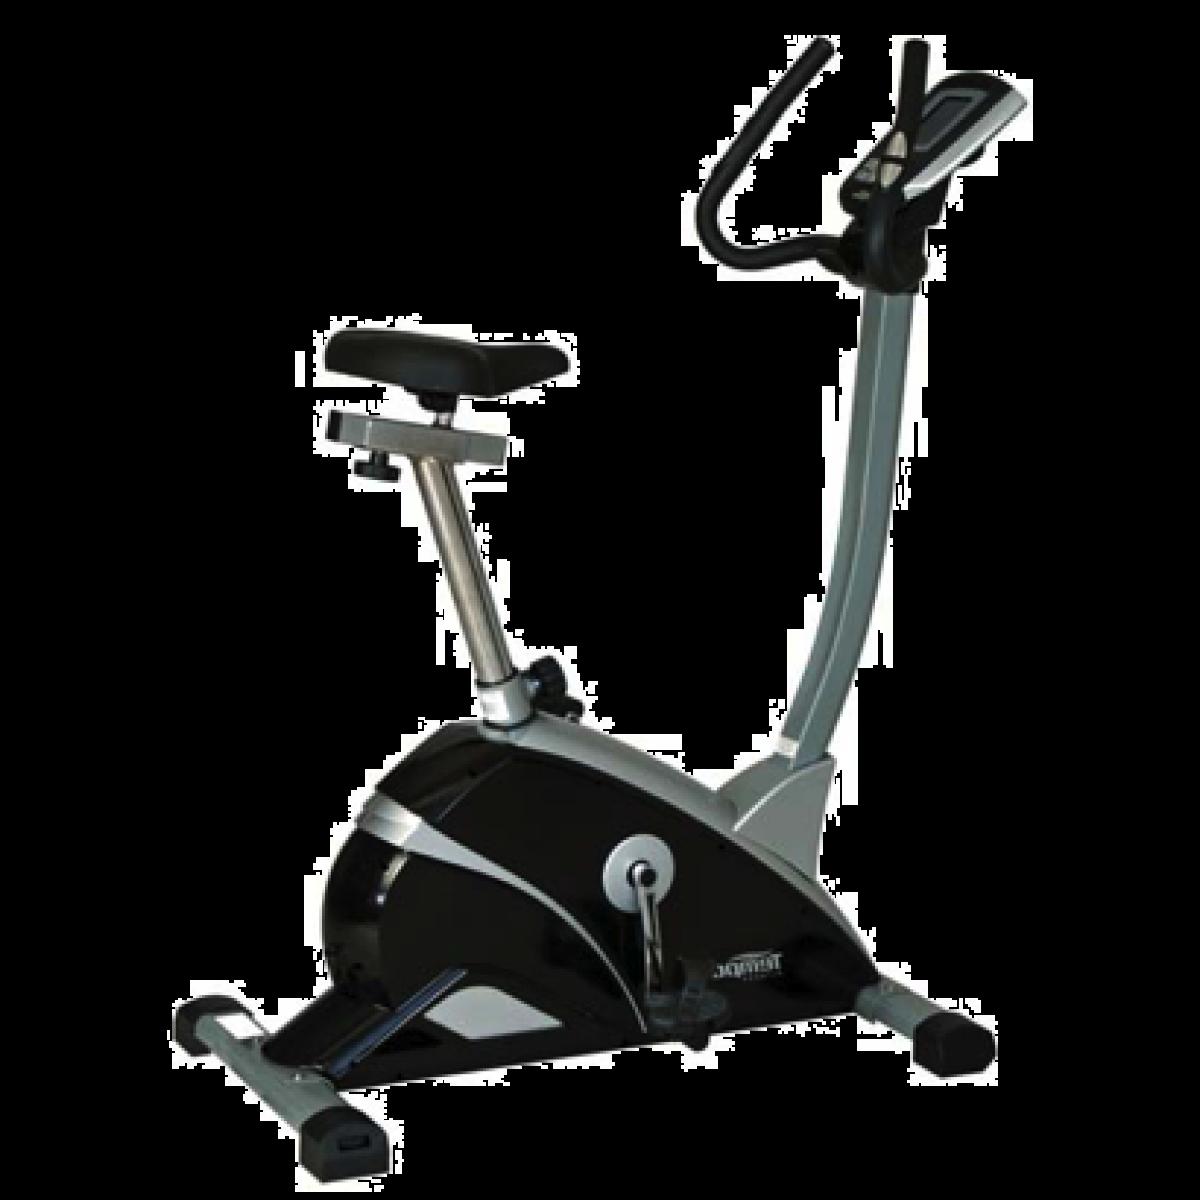 Exercise Bike Png Transparent Image - Exercise Bike, Transparent background PNG HD thumbnail